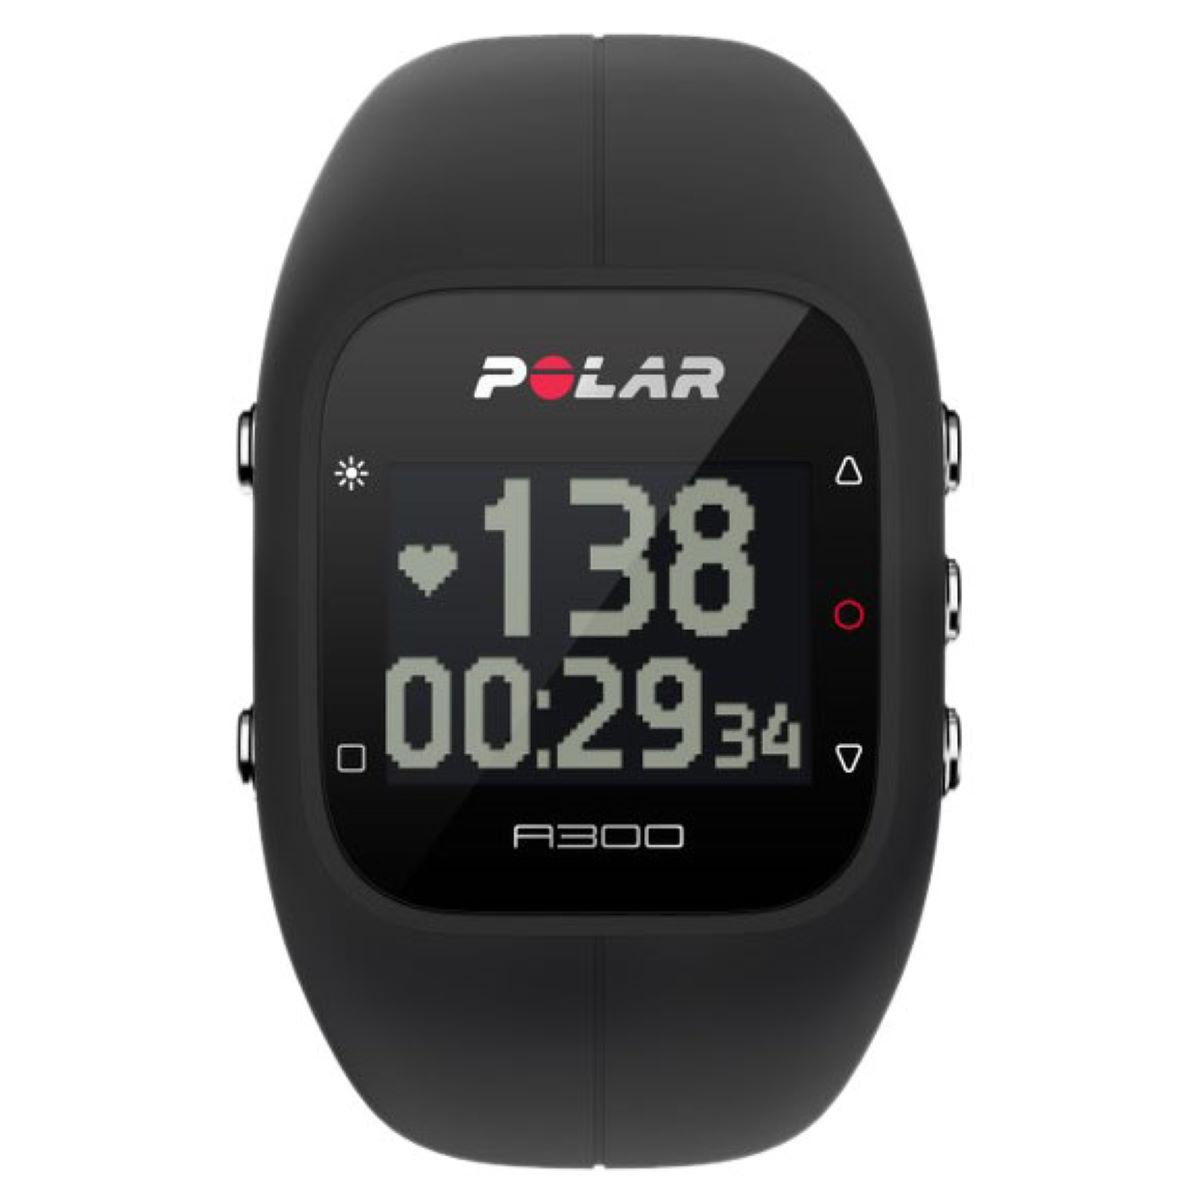 3a5a2396ebbf Reloj Polar A300 Fitness - Monitores de actividad